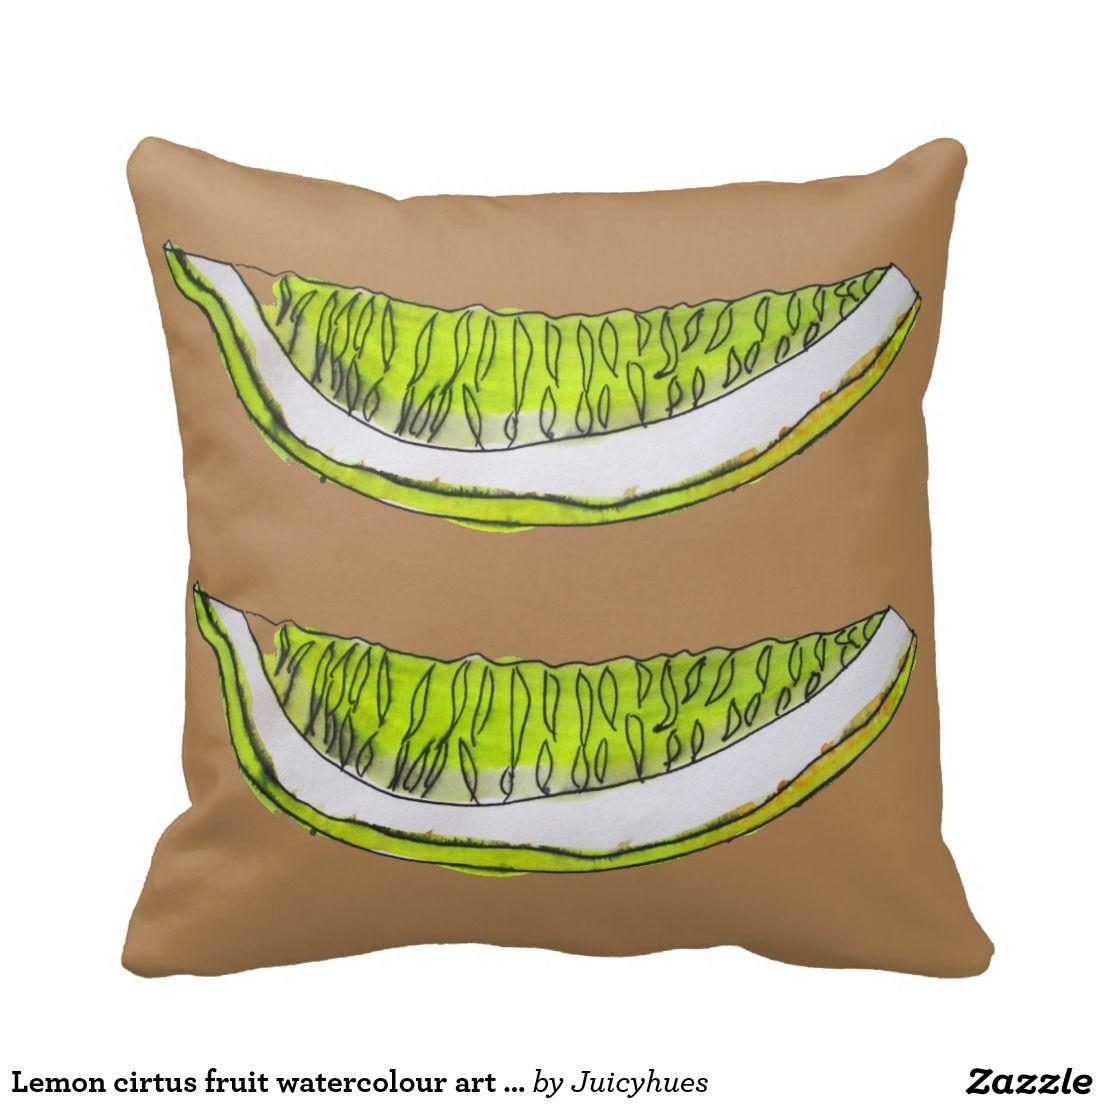 Lemon cirtus fruit watercolour art illustration pillow